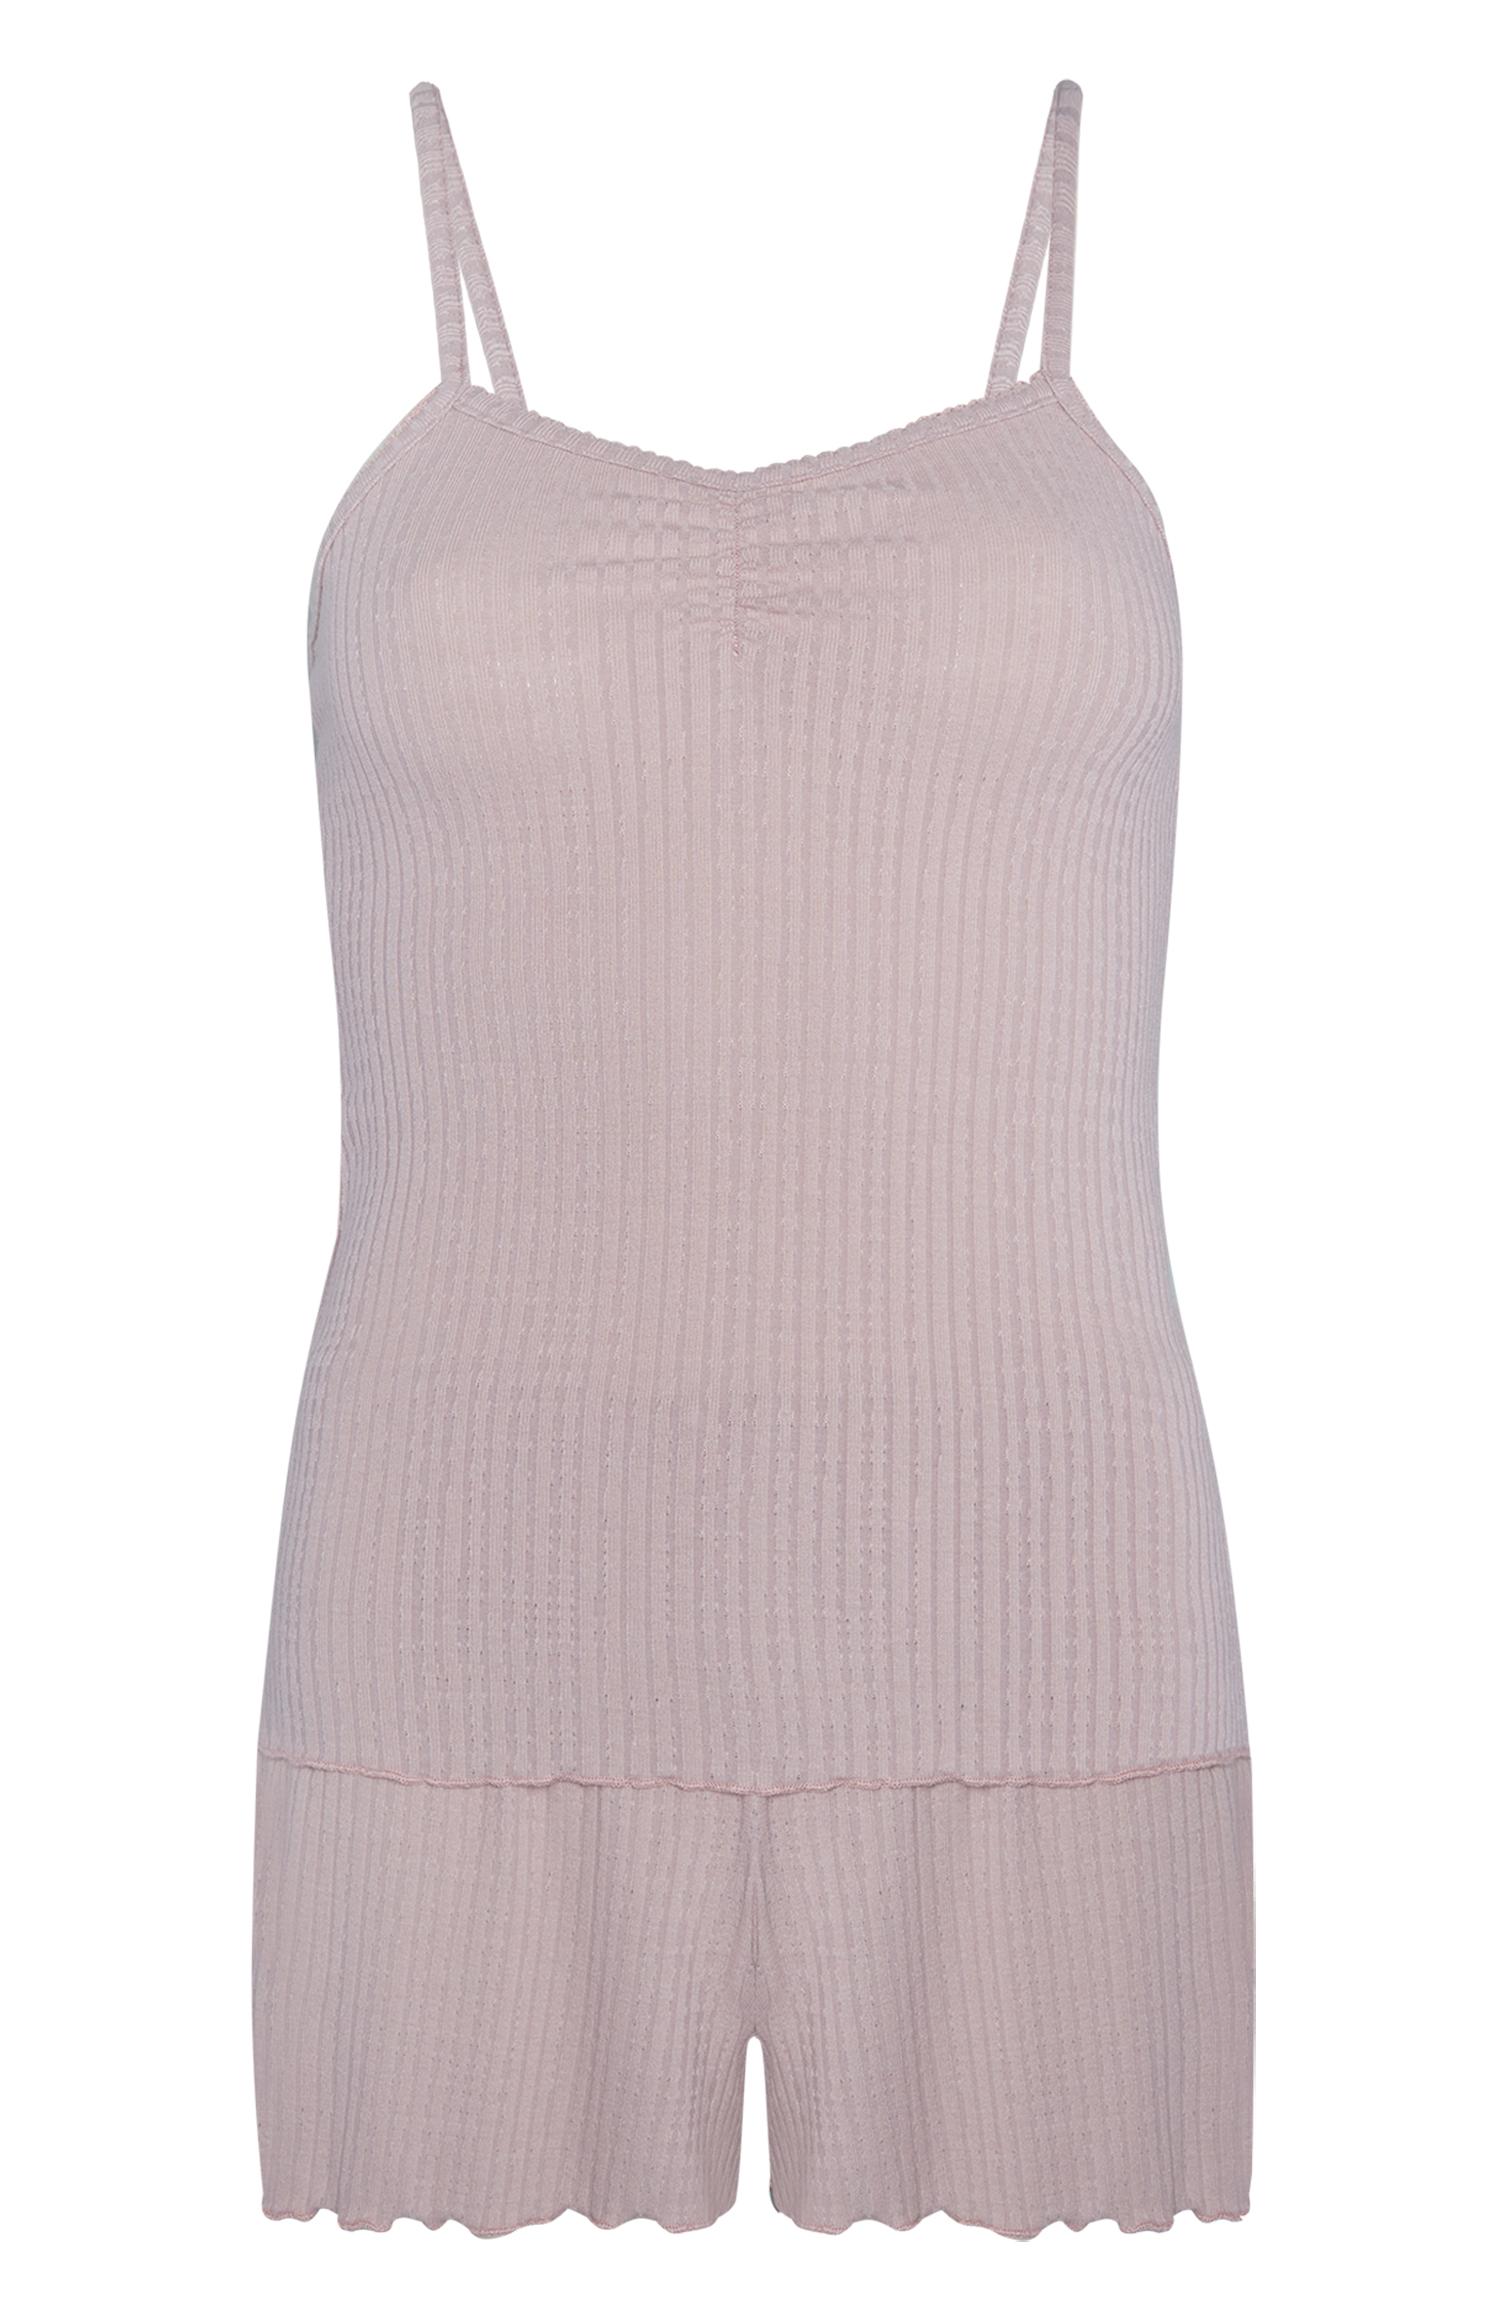 Set de camisa y short rosa